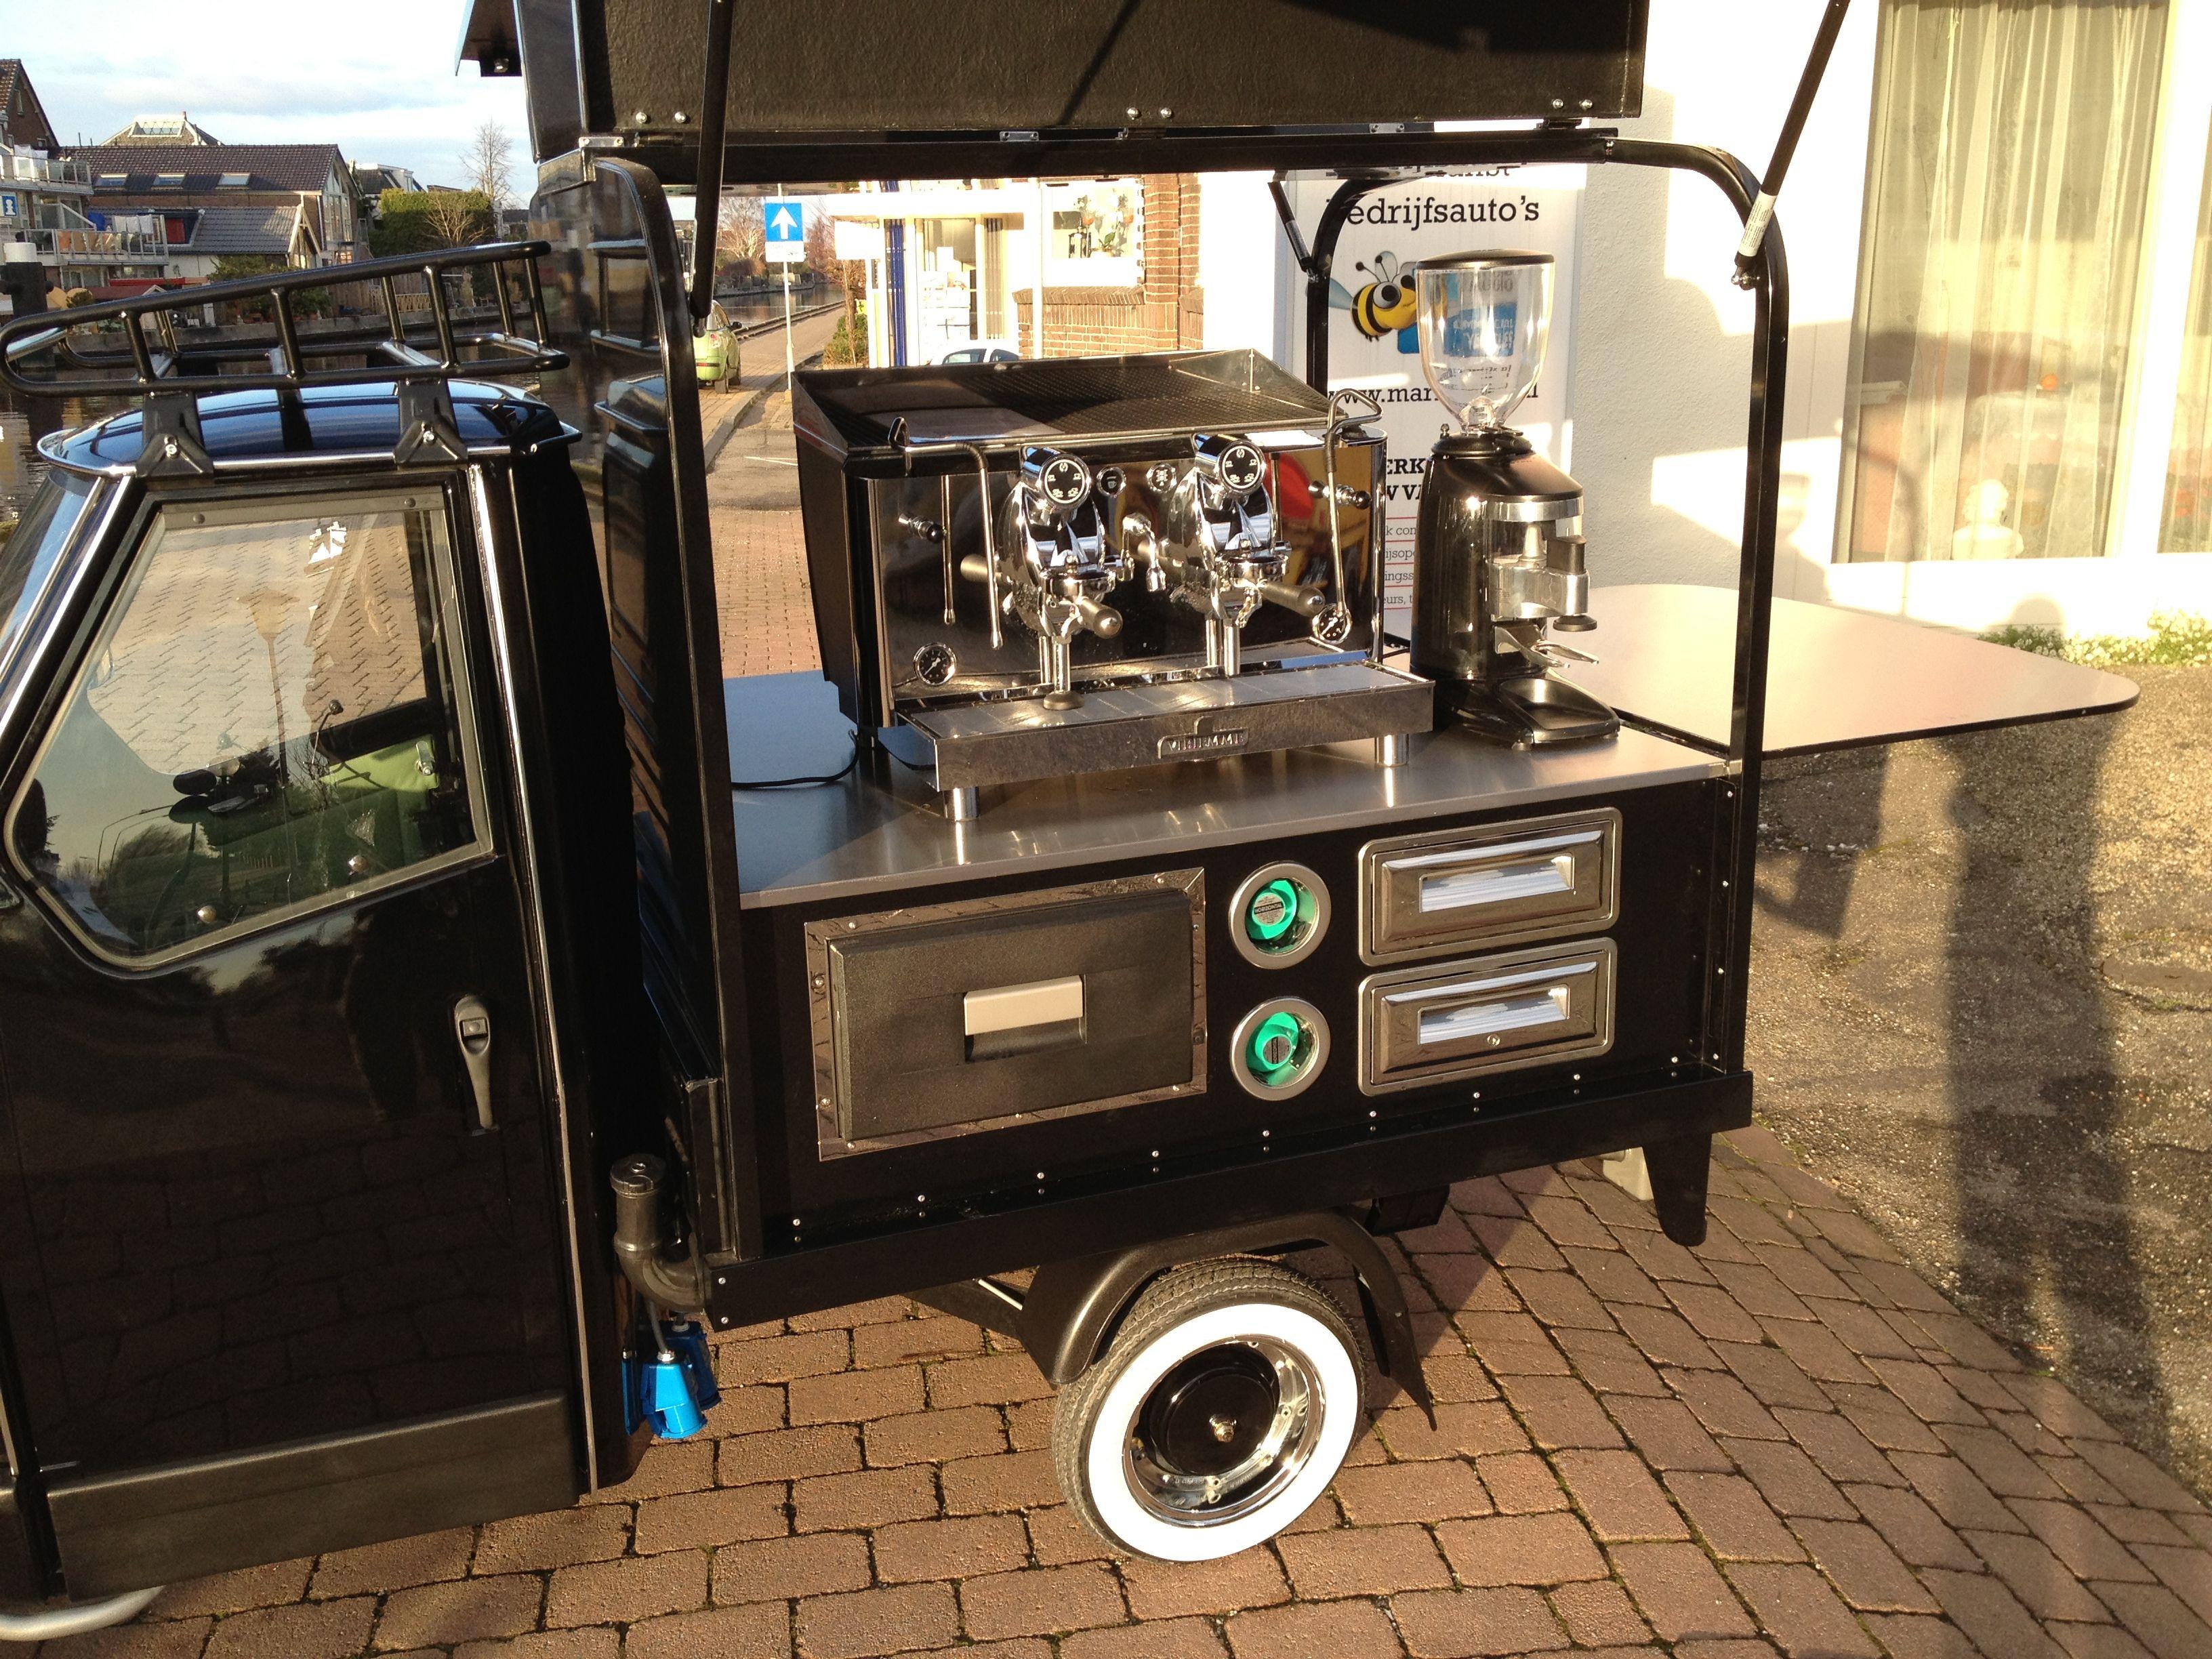 piaggio ape kaffee caf m vil mobile coffee. Black Bedroom Furniture Sets. Home Design Ideas